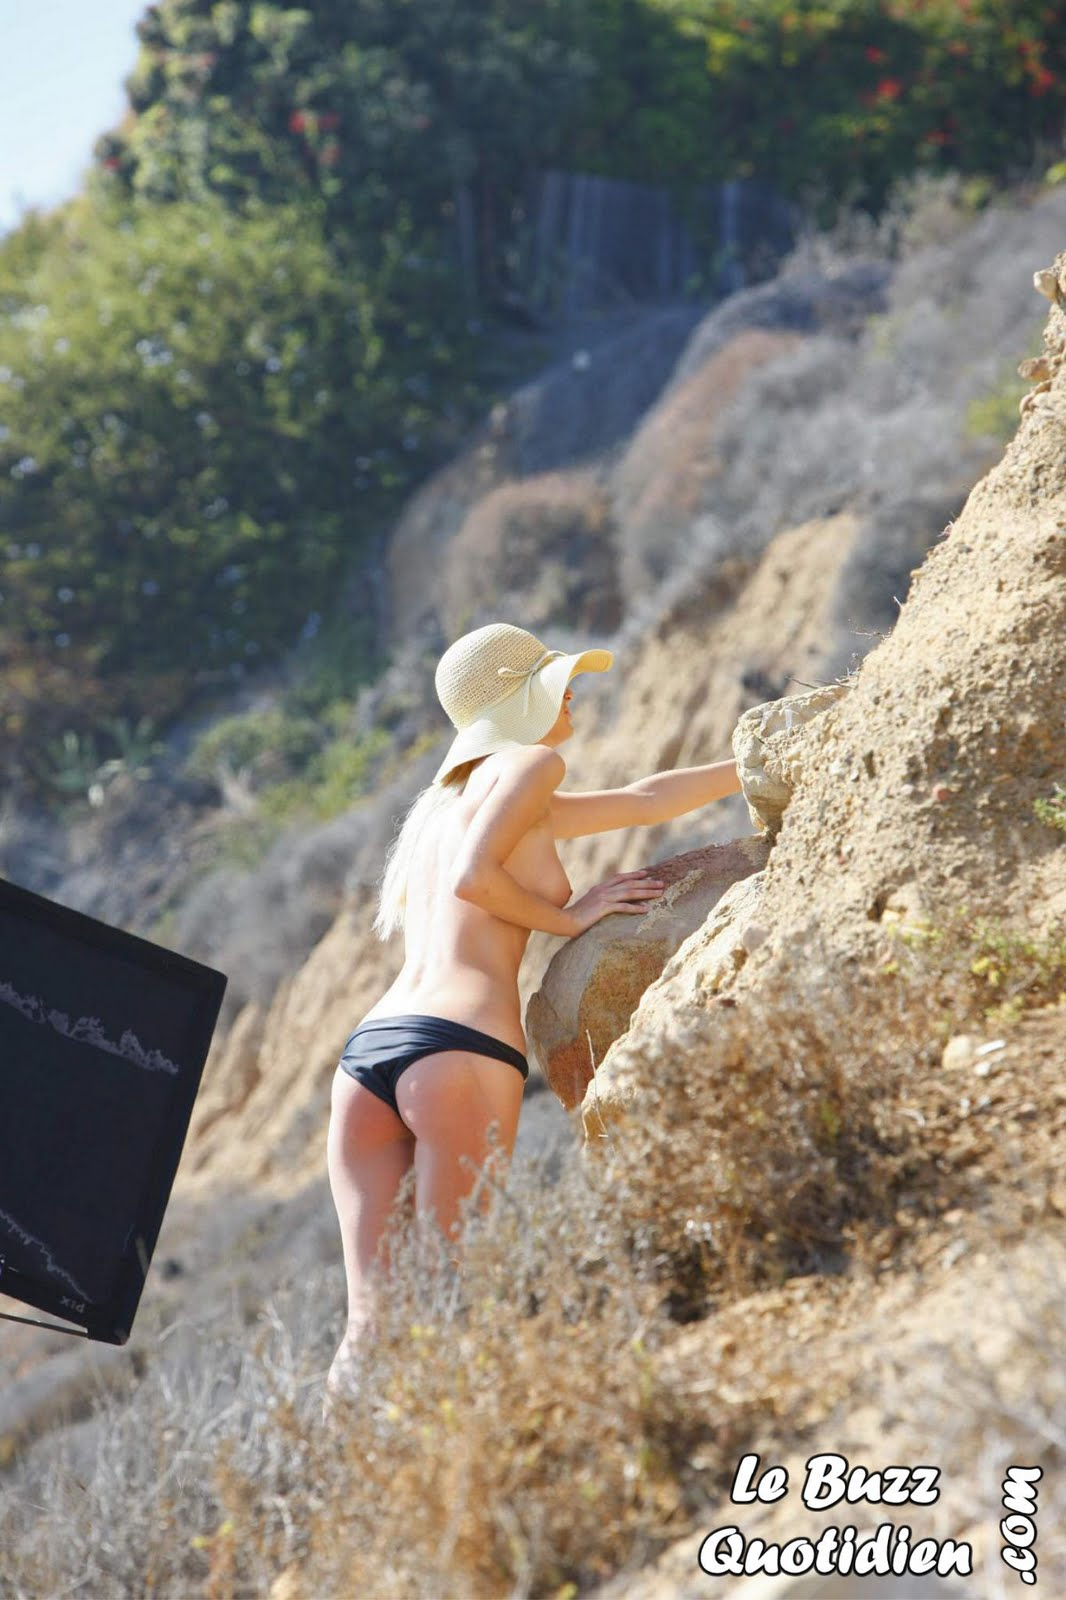 Paris-Hilton-topless